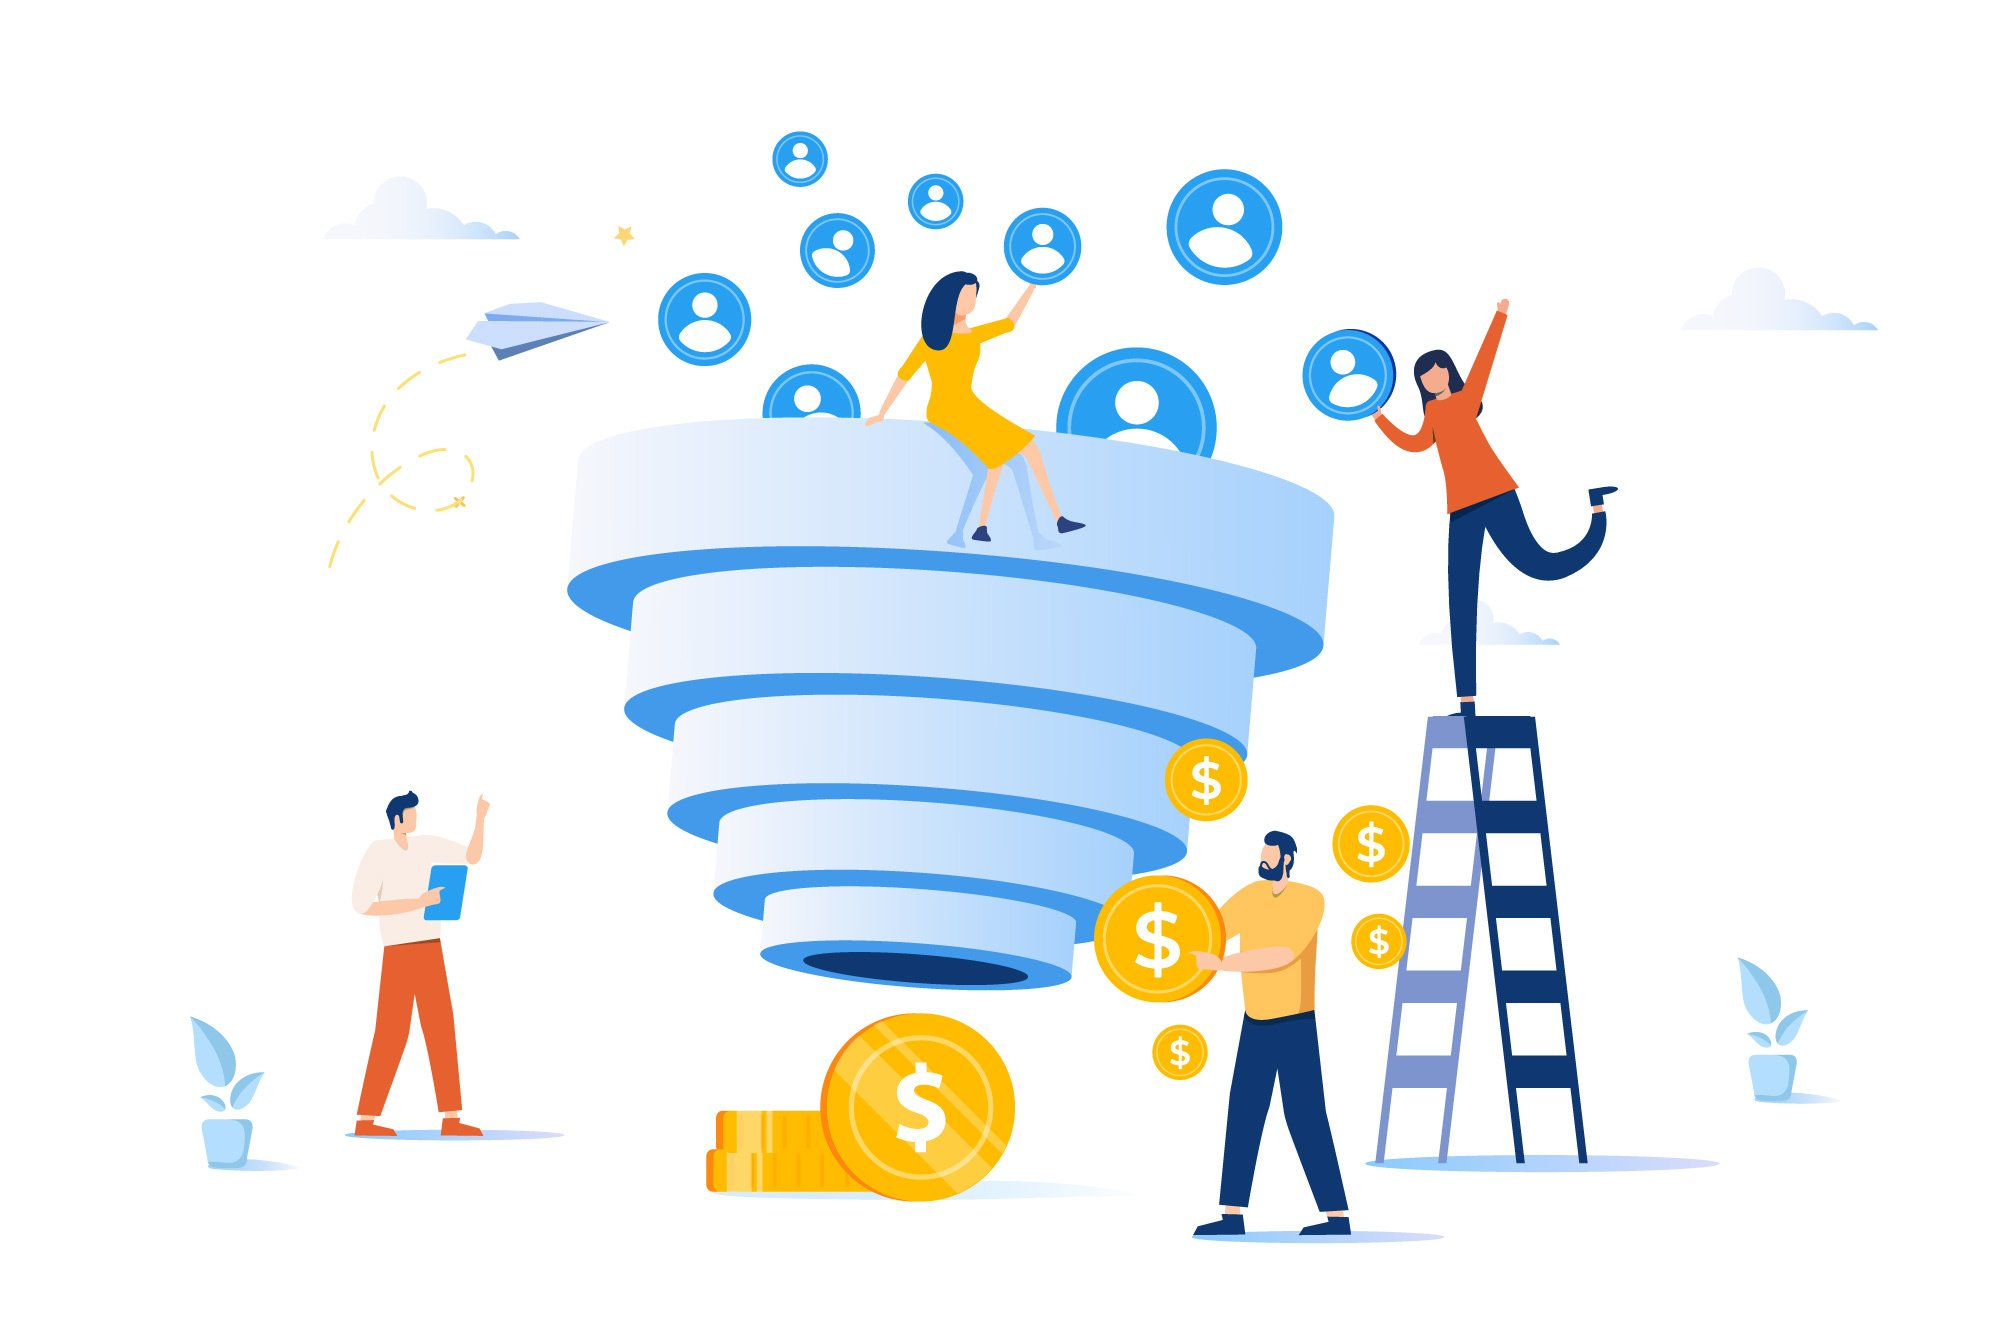 Top 5 benefits of using HubSpot's CRM tool